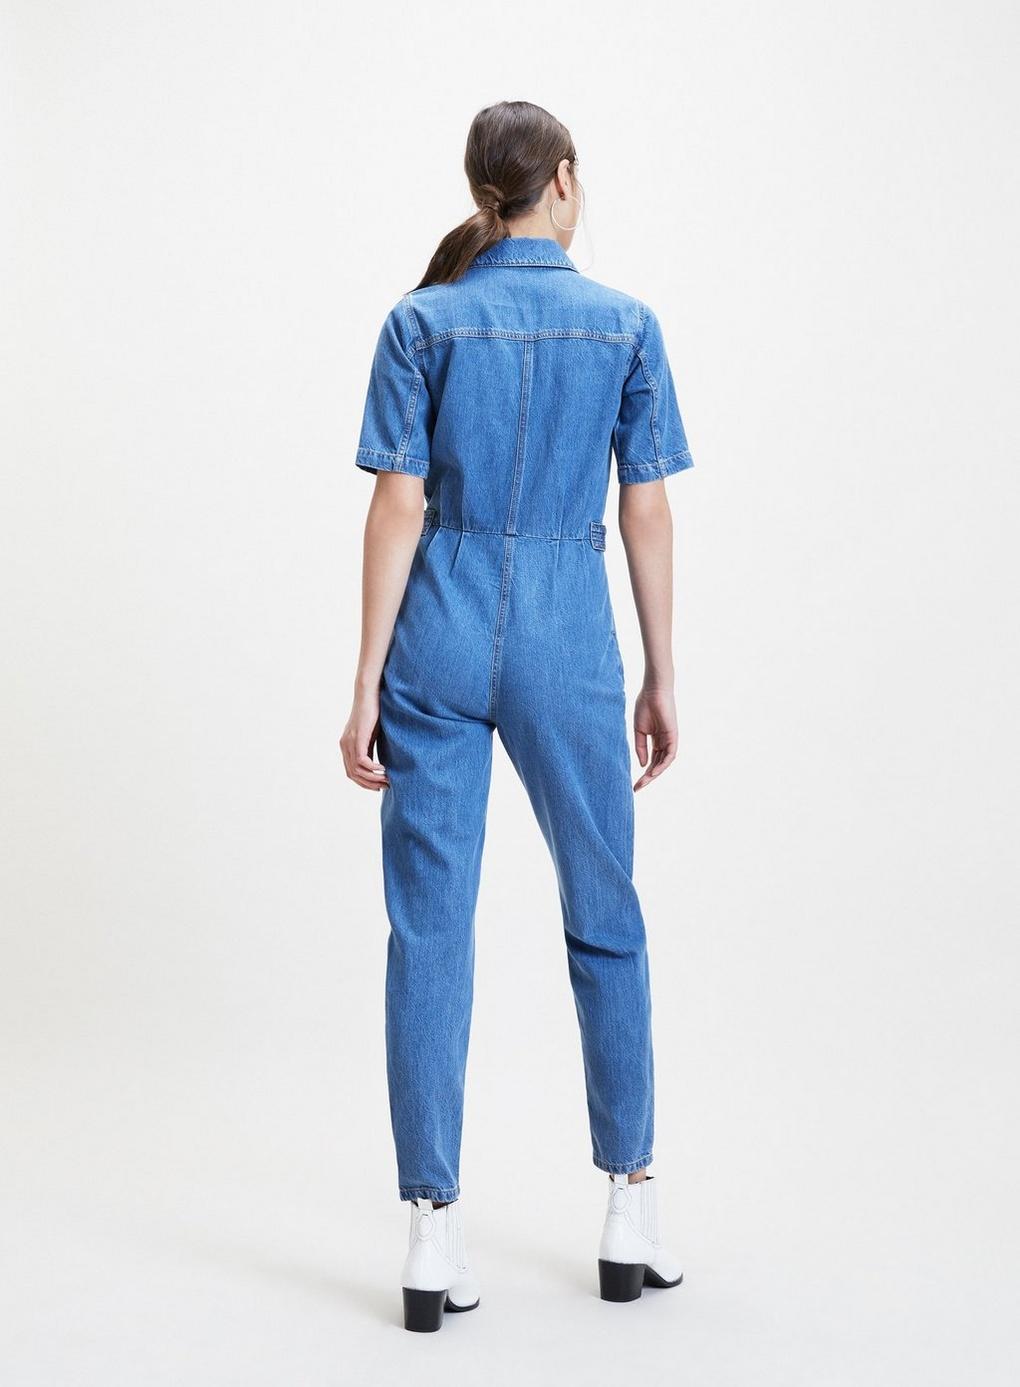 a05ce66d8c0 Lyst - Miss Selfridge Blue Short Sleeve Boiler Jumpsuit in Blue